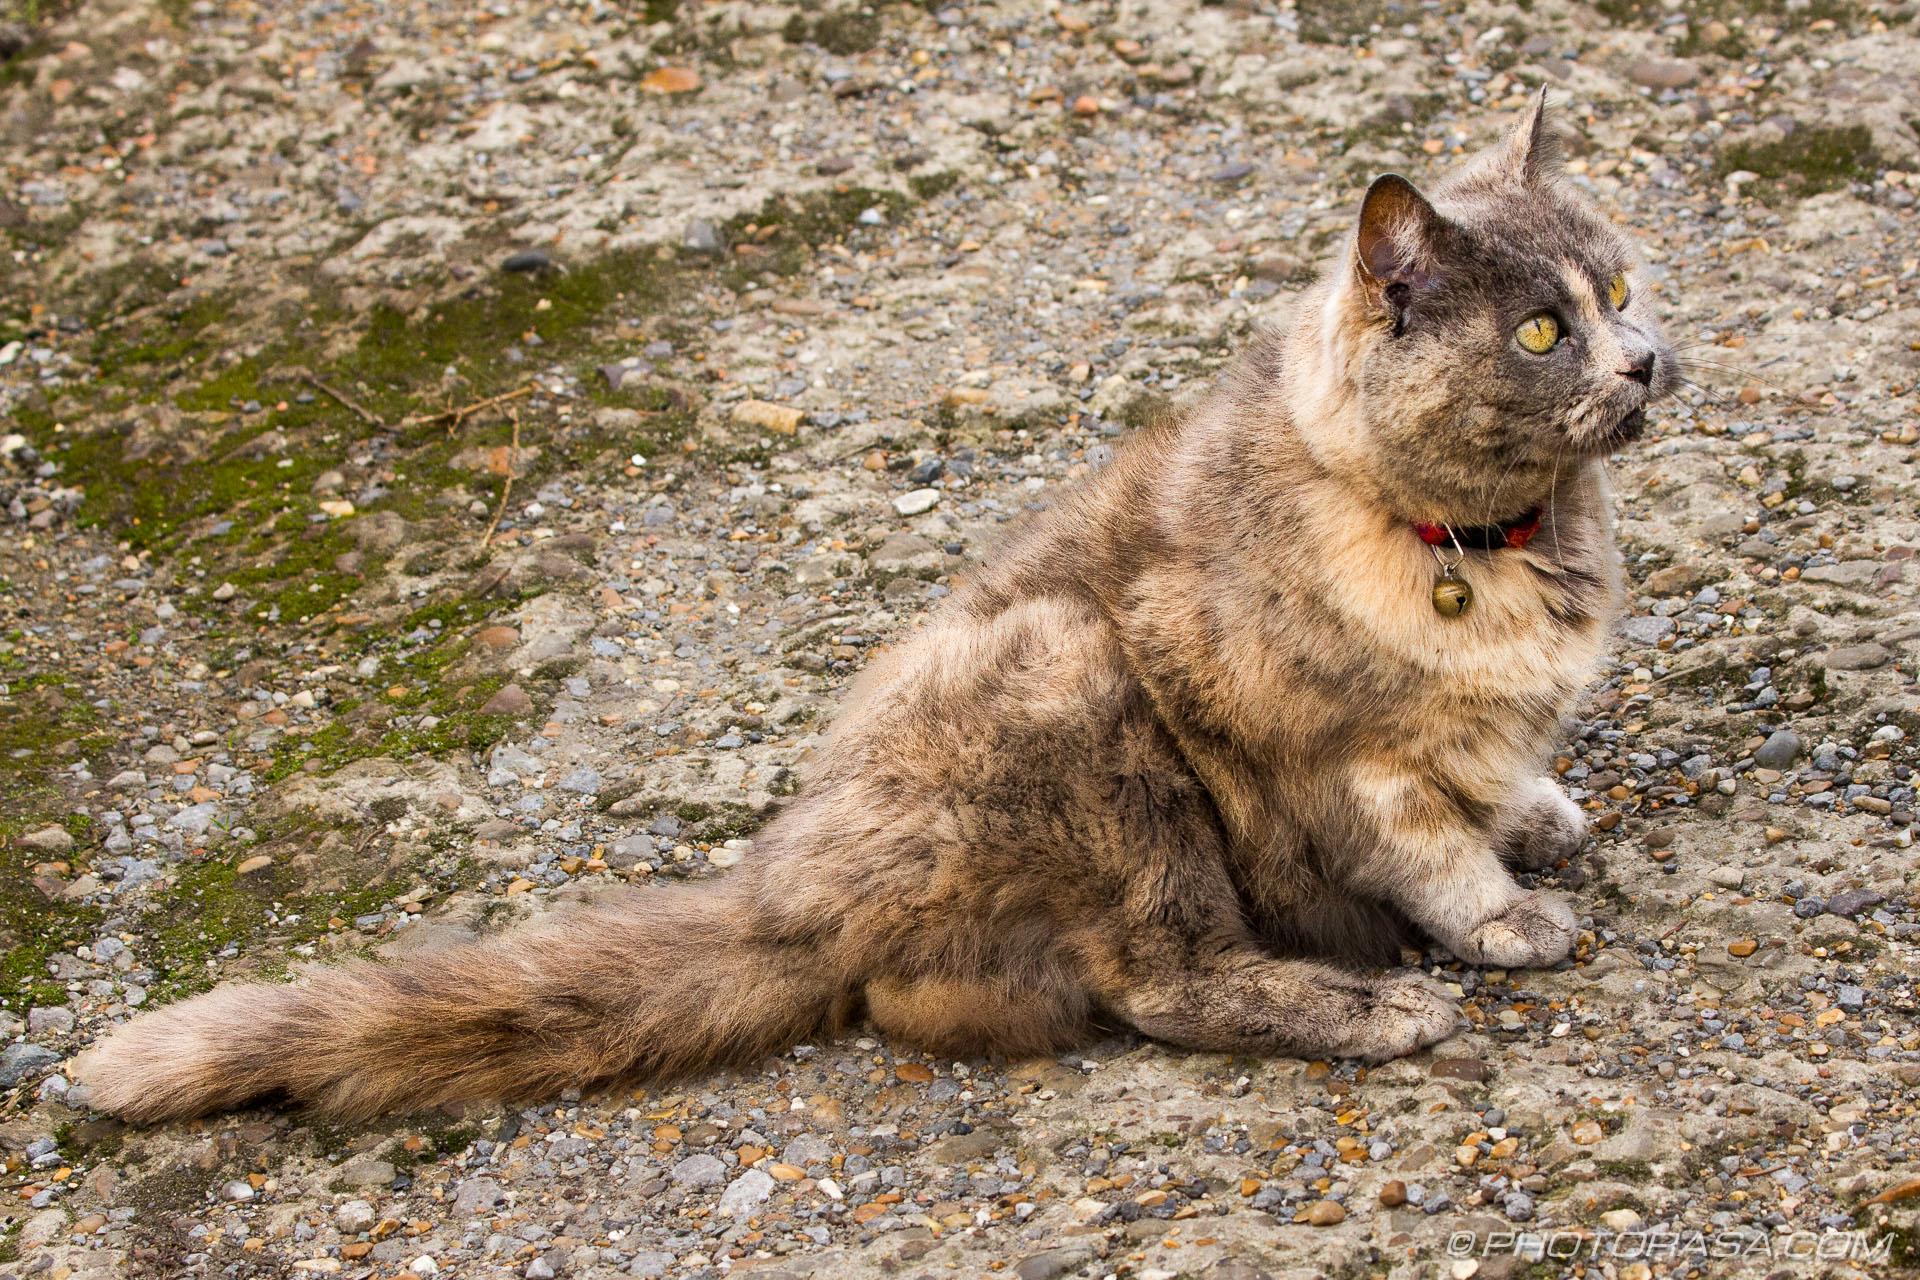 http://photorasa.com/grey-ginger-moggy/grey-ginger-cat-4/